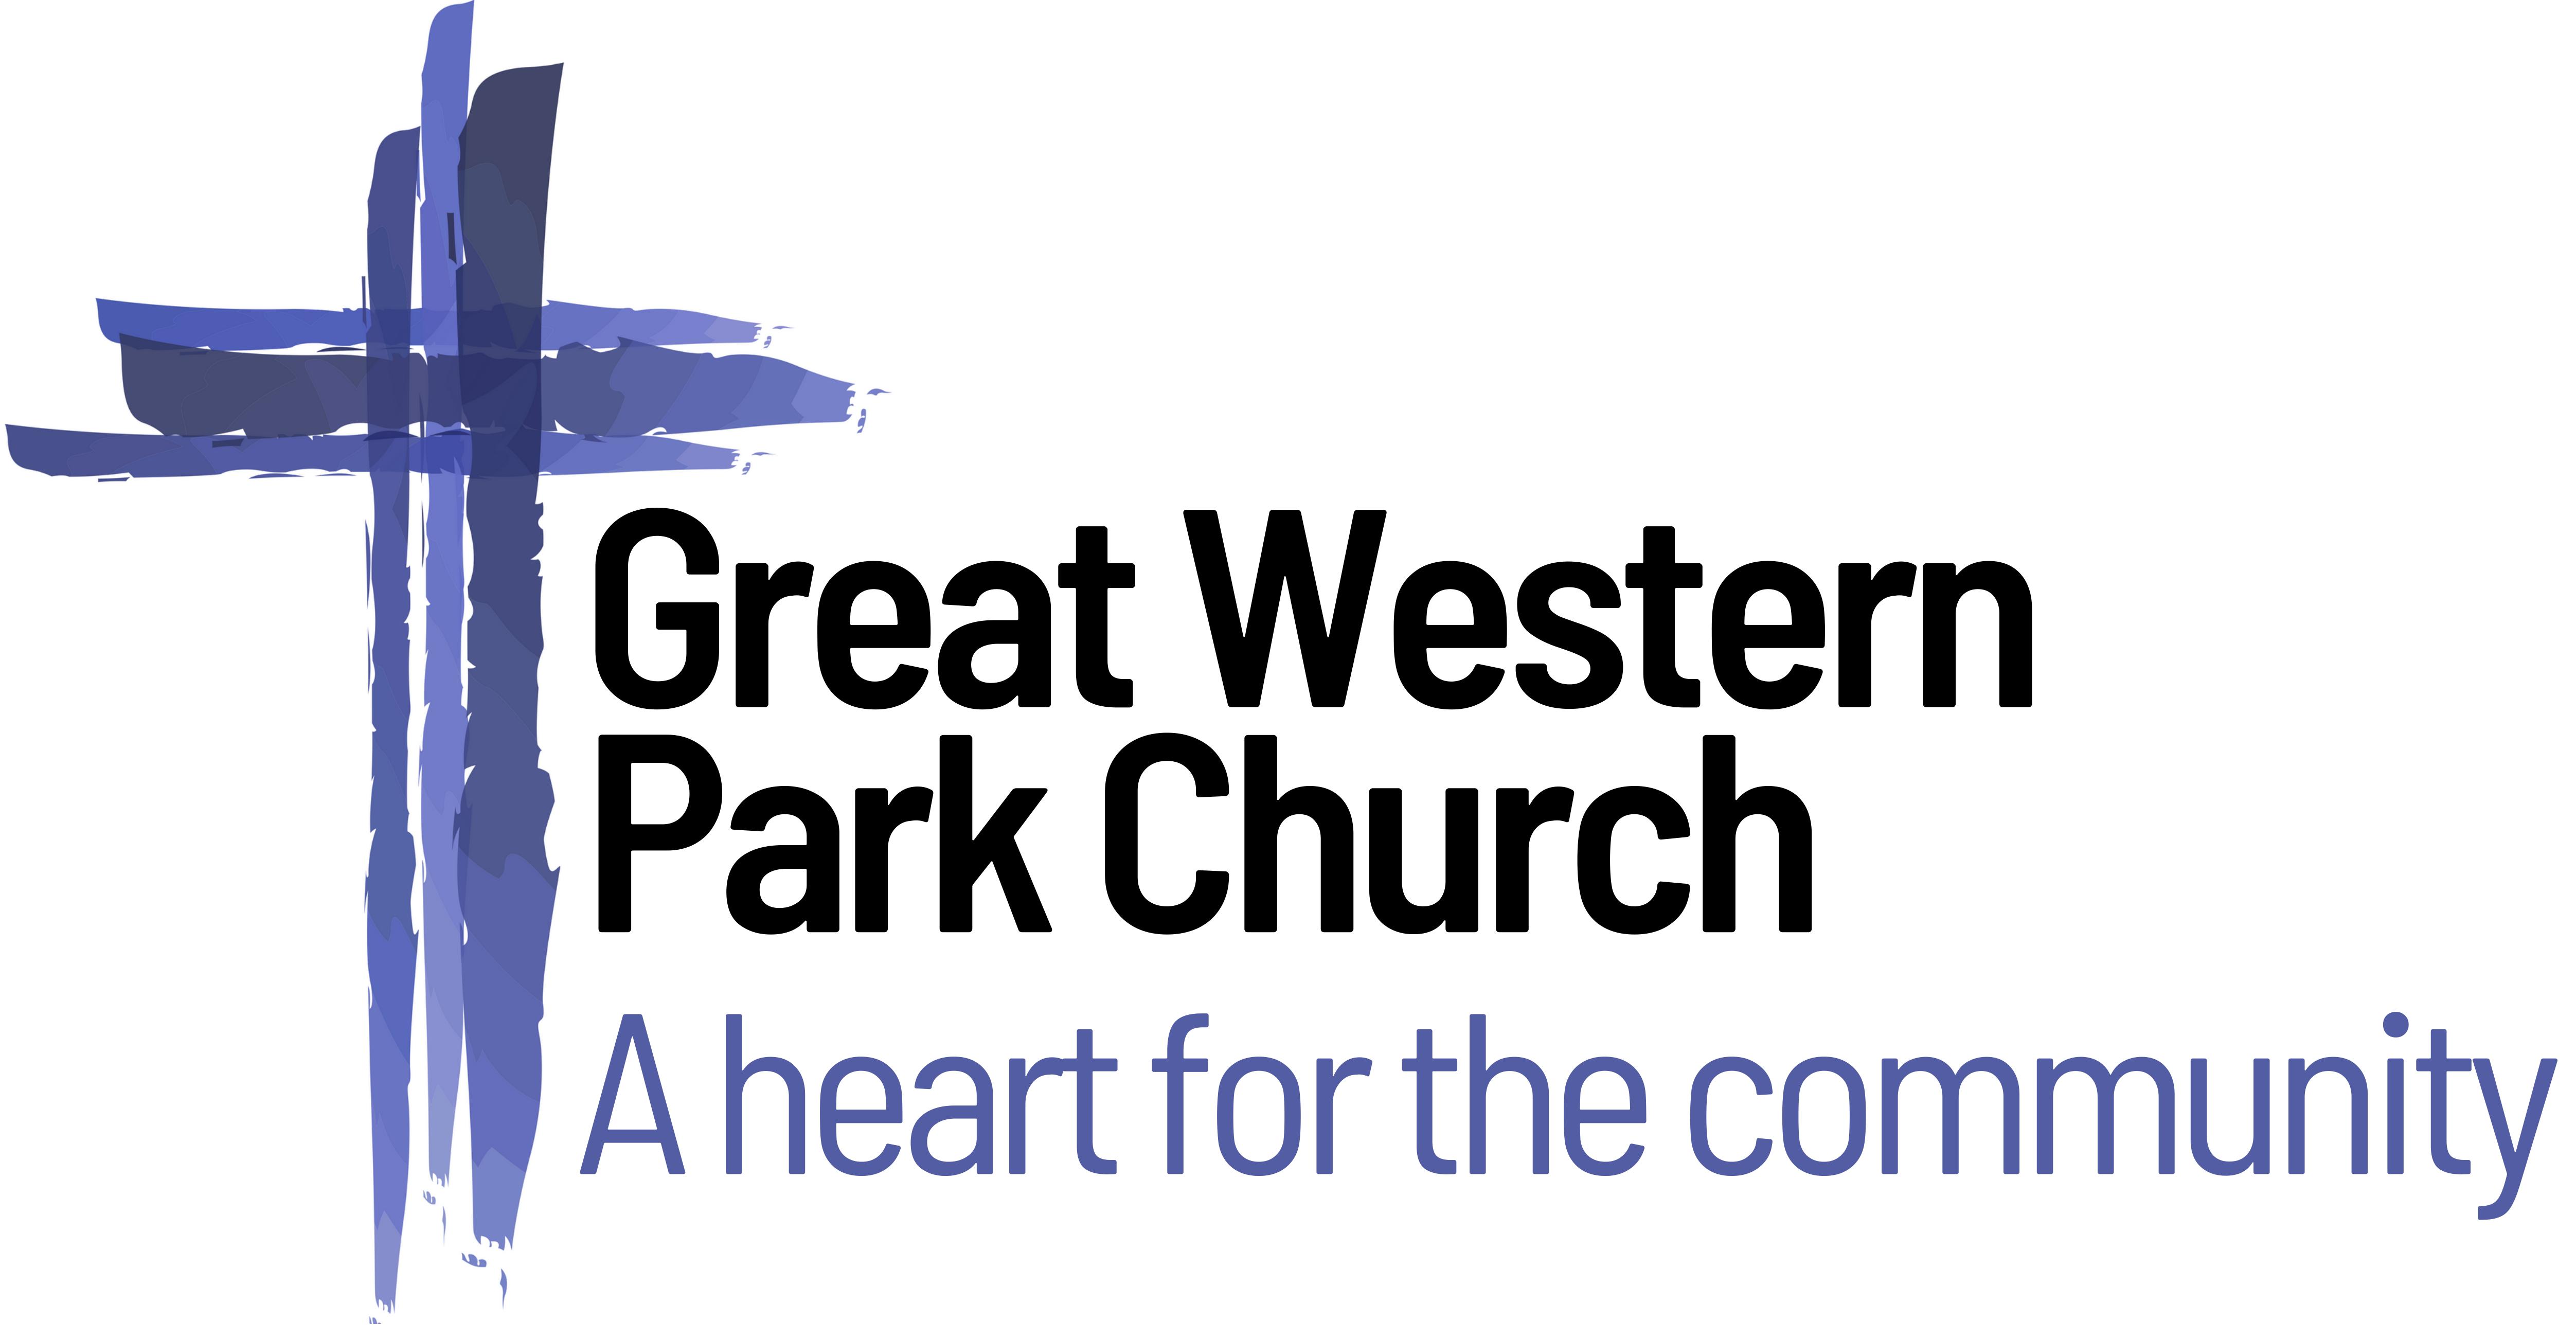 Great Western Park Church